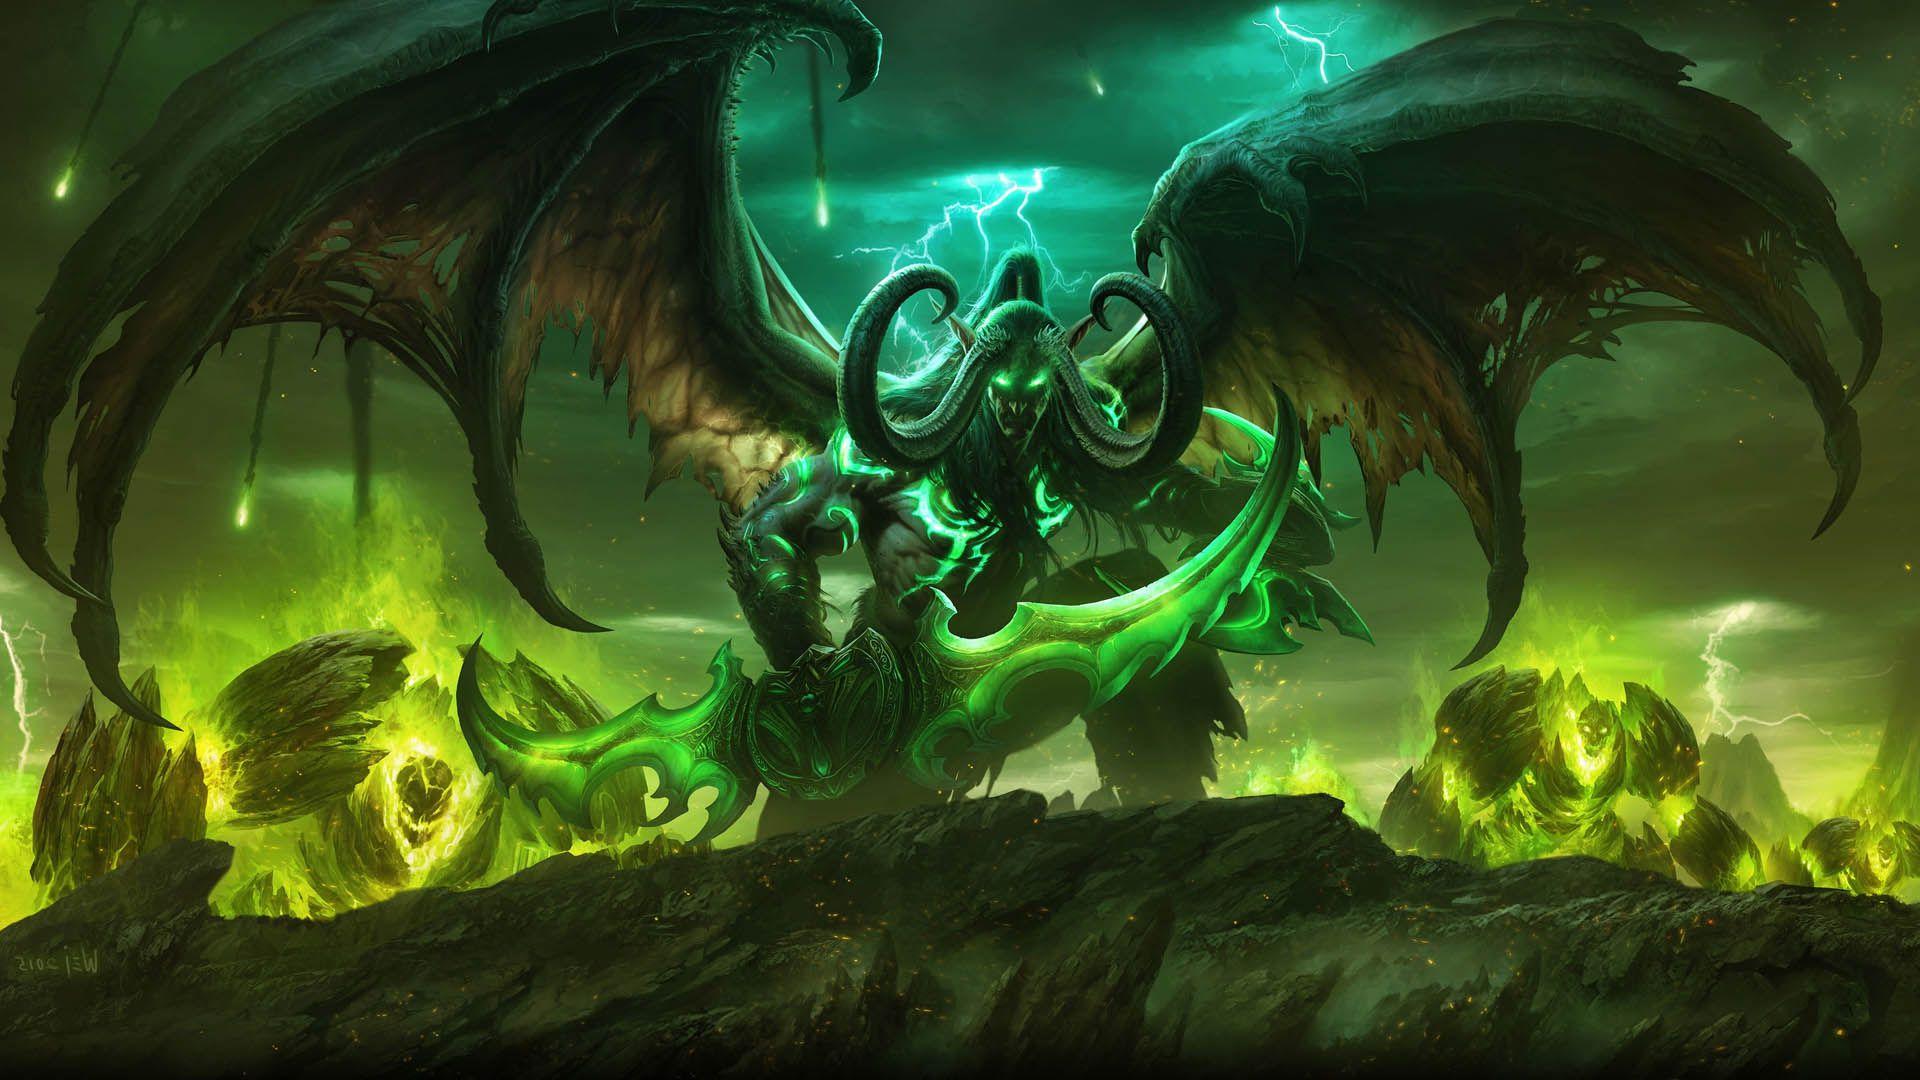 world-of-warcraft-legion-deluxe-edition-wallpaper.jpg